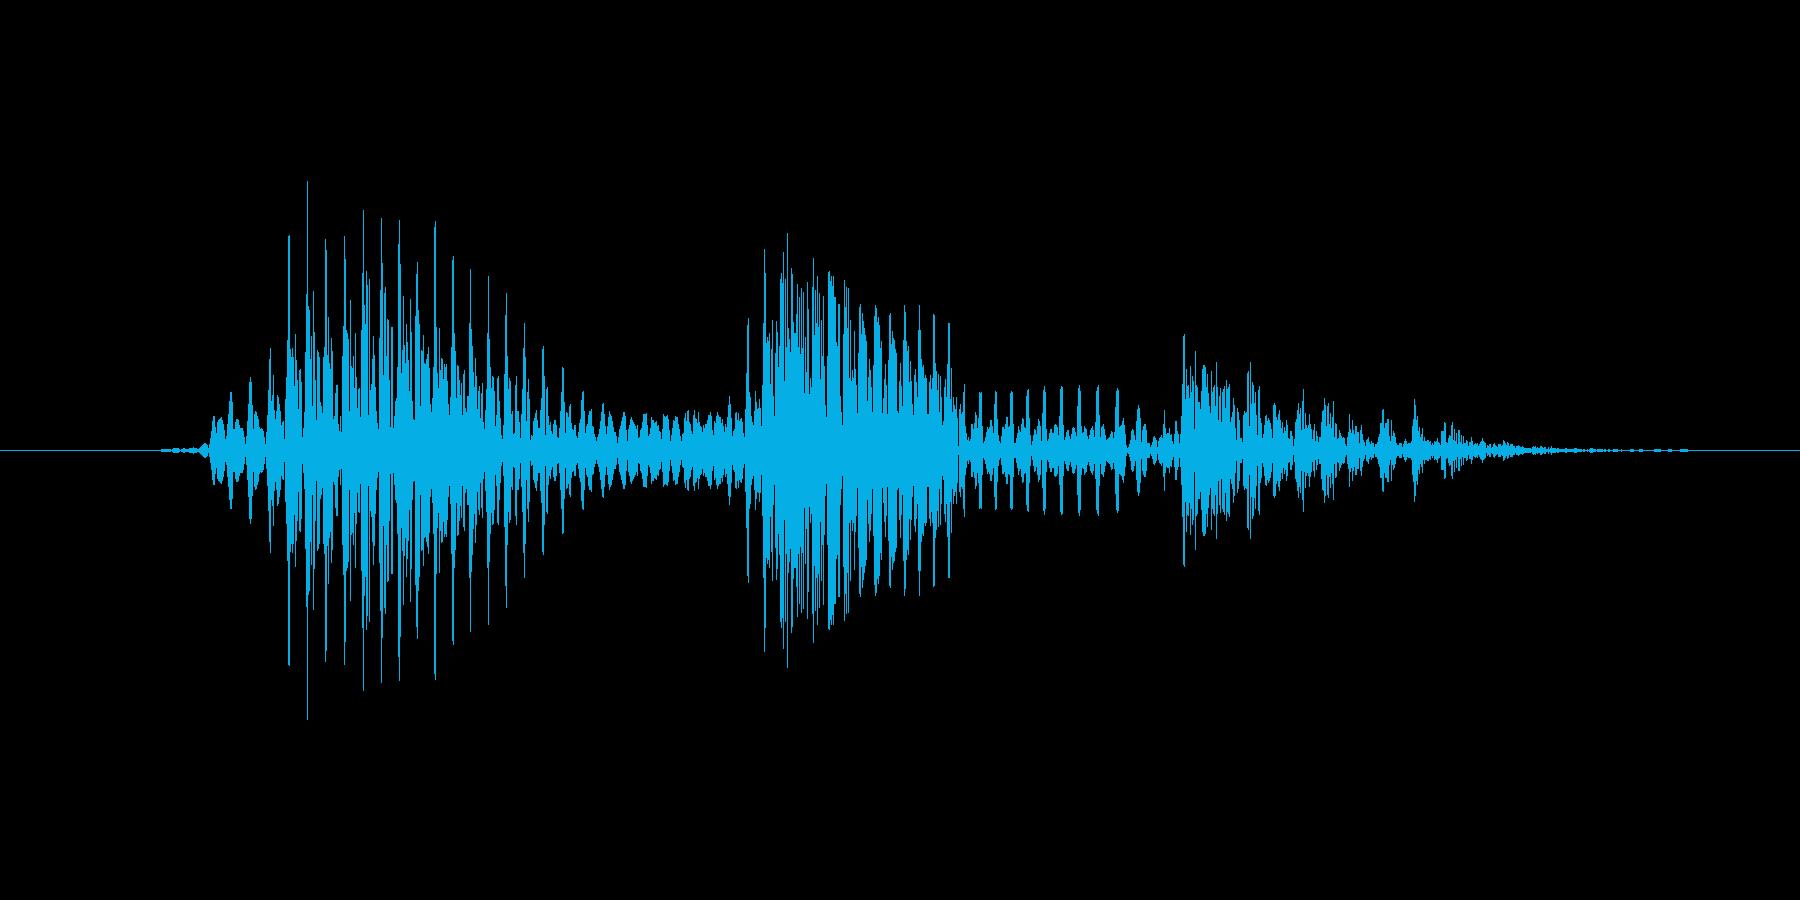 「November」英語発音の再生済みの波形